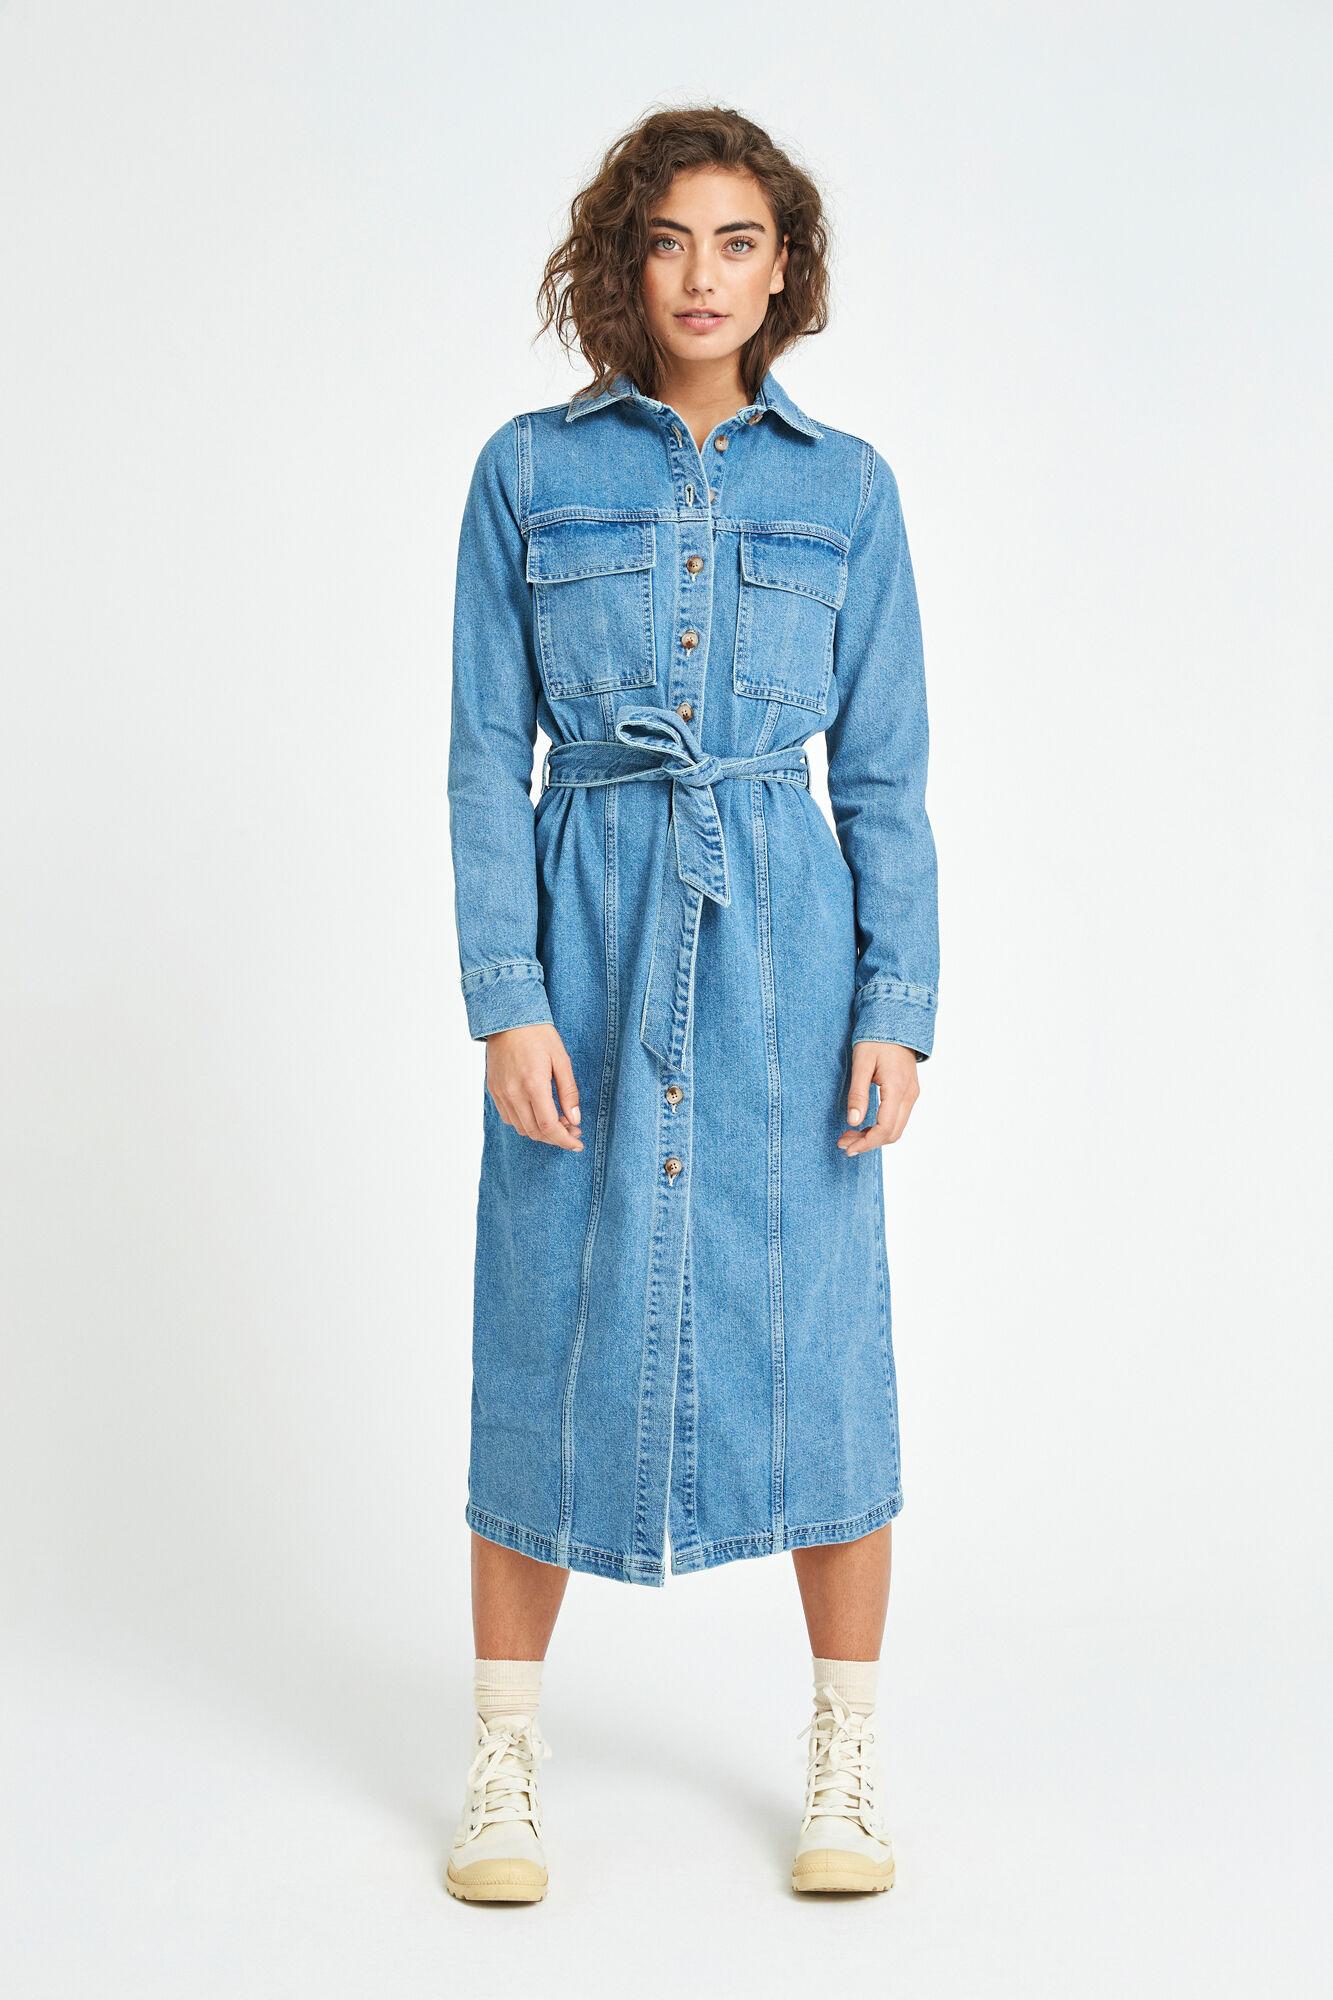 ENSURREAL LS DRESS 6513